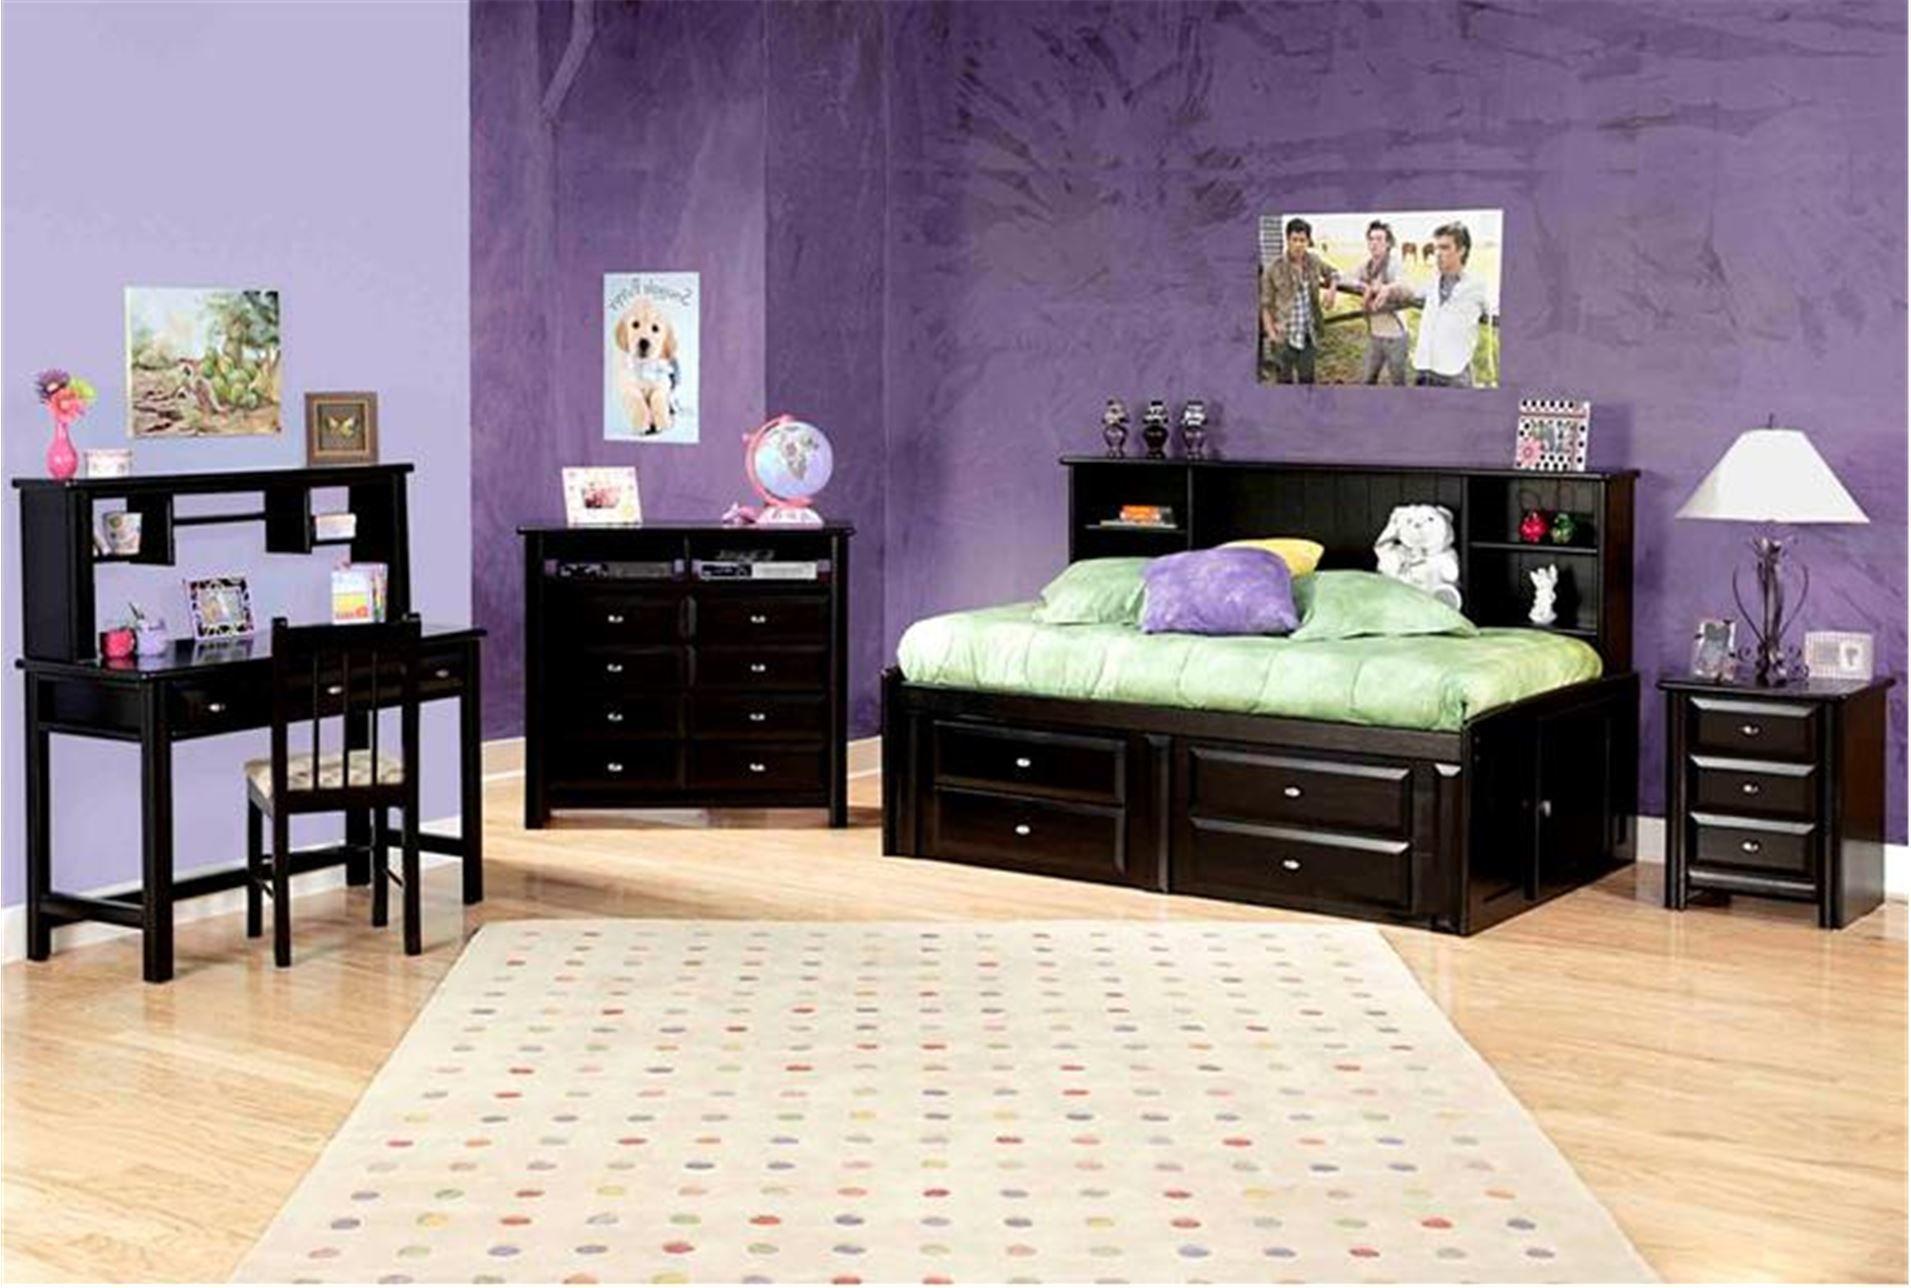 4 bedroom loft  Laguna Black Full RoomsaverDrawers  Kids rooms  Pinterest